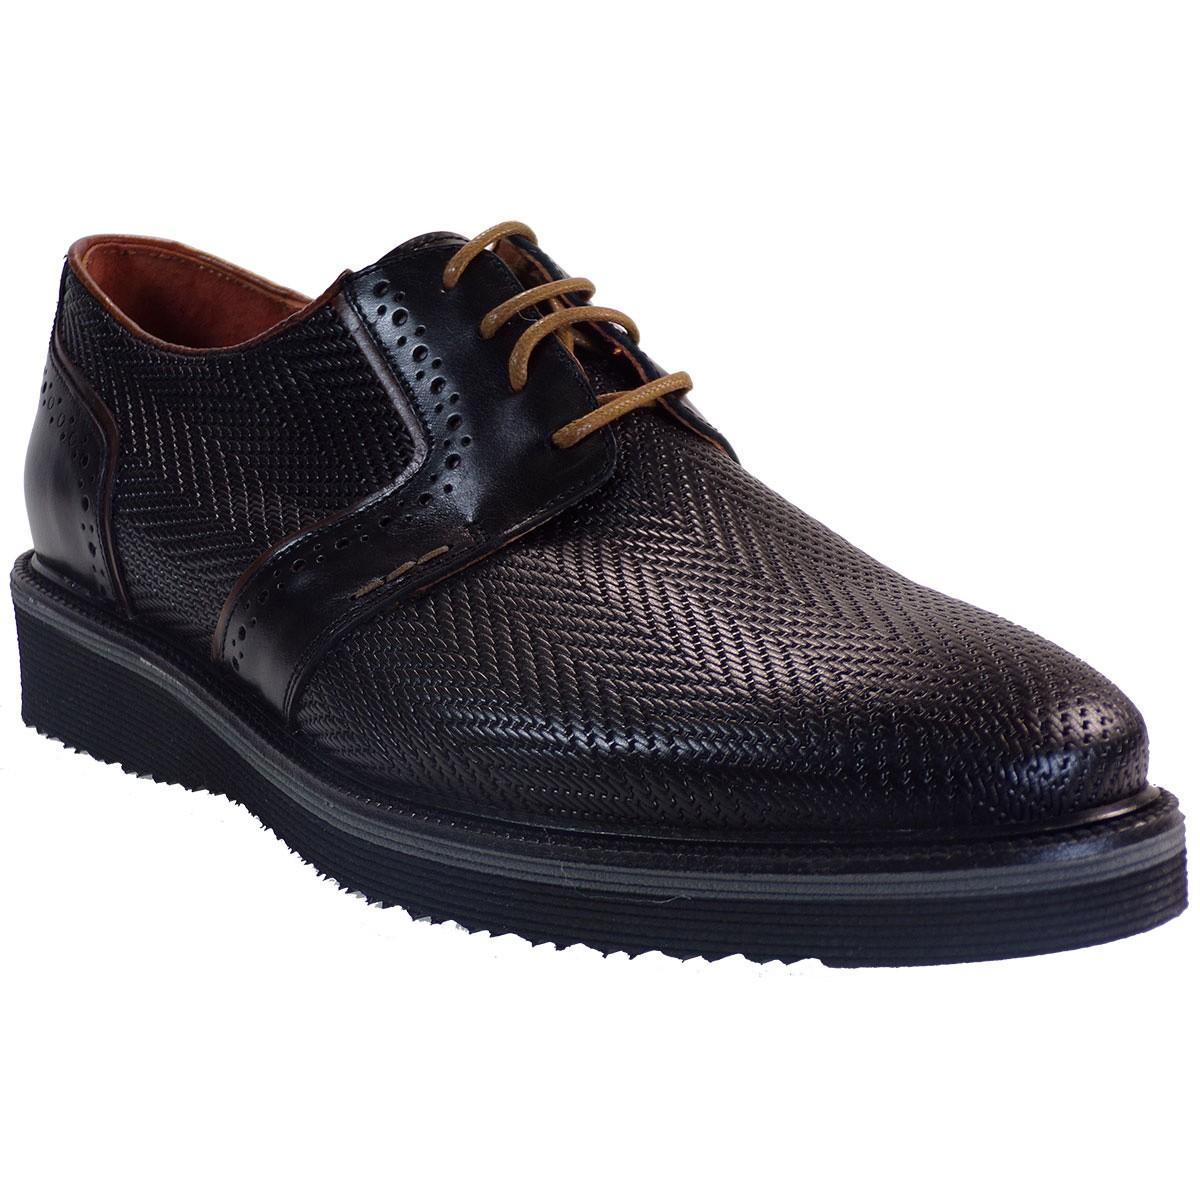 kricket Ανδρικά Παπούτσια 220 Μαύρο Δέρμα